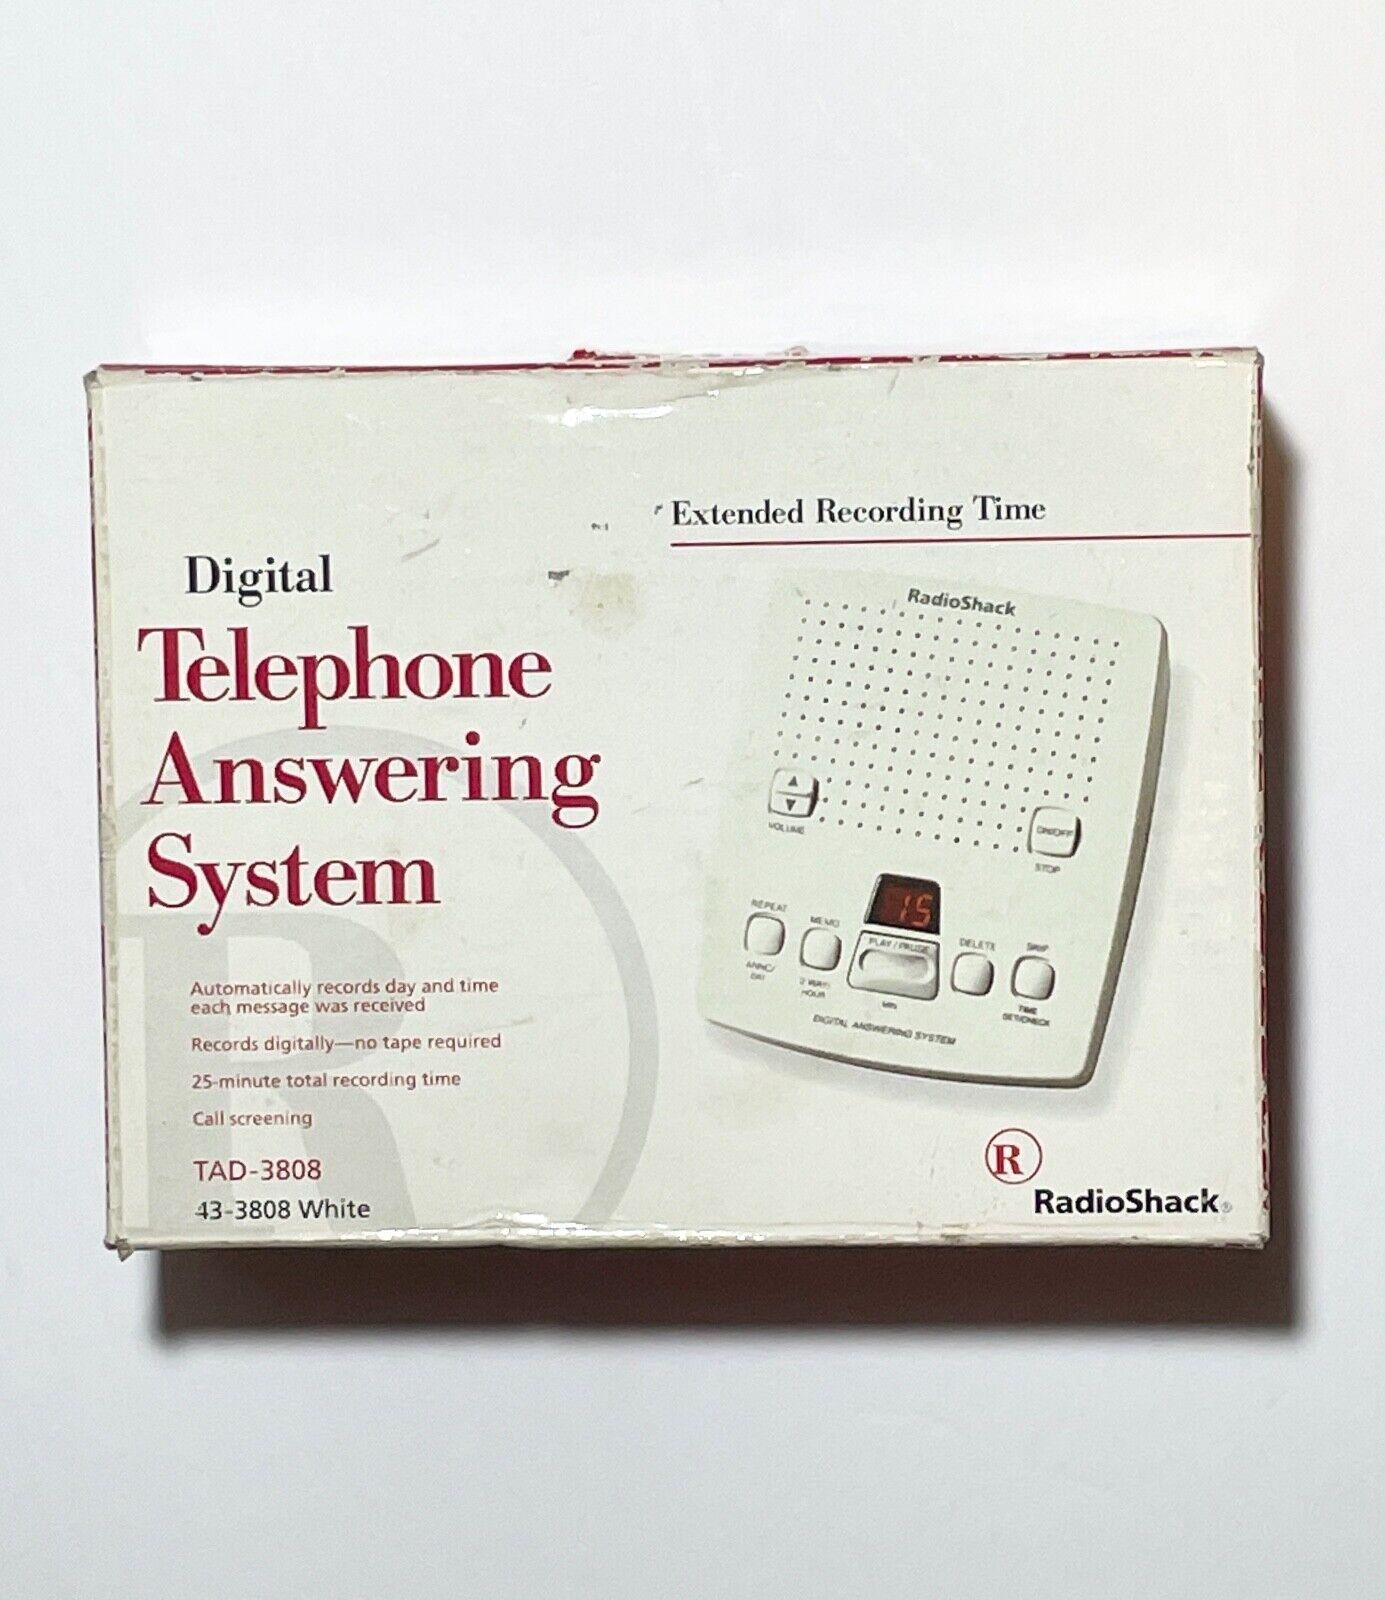 RADIO SHACK VINTAGE Digital Telephone Answering Machine 43-3